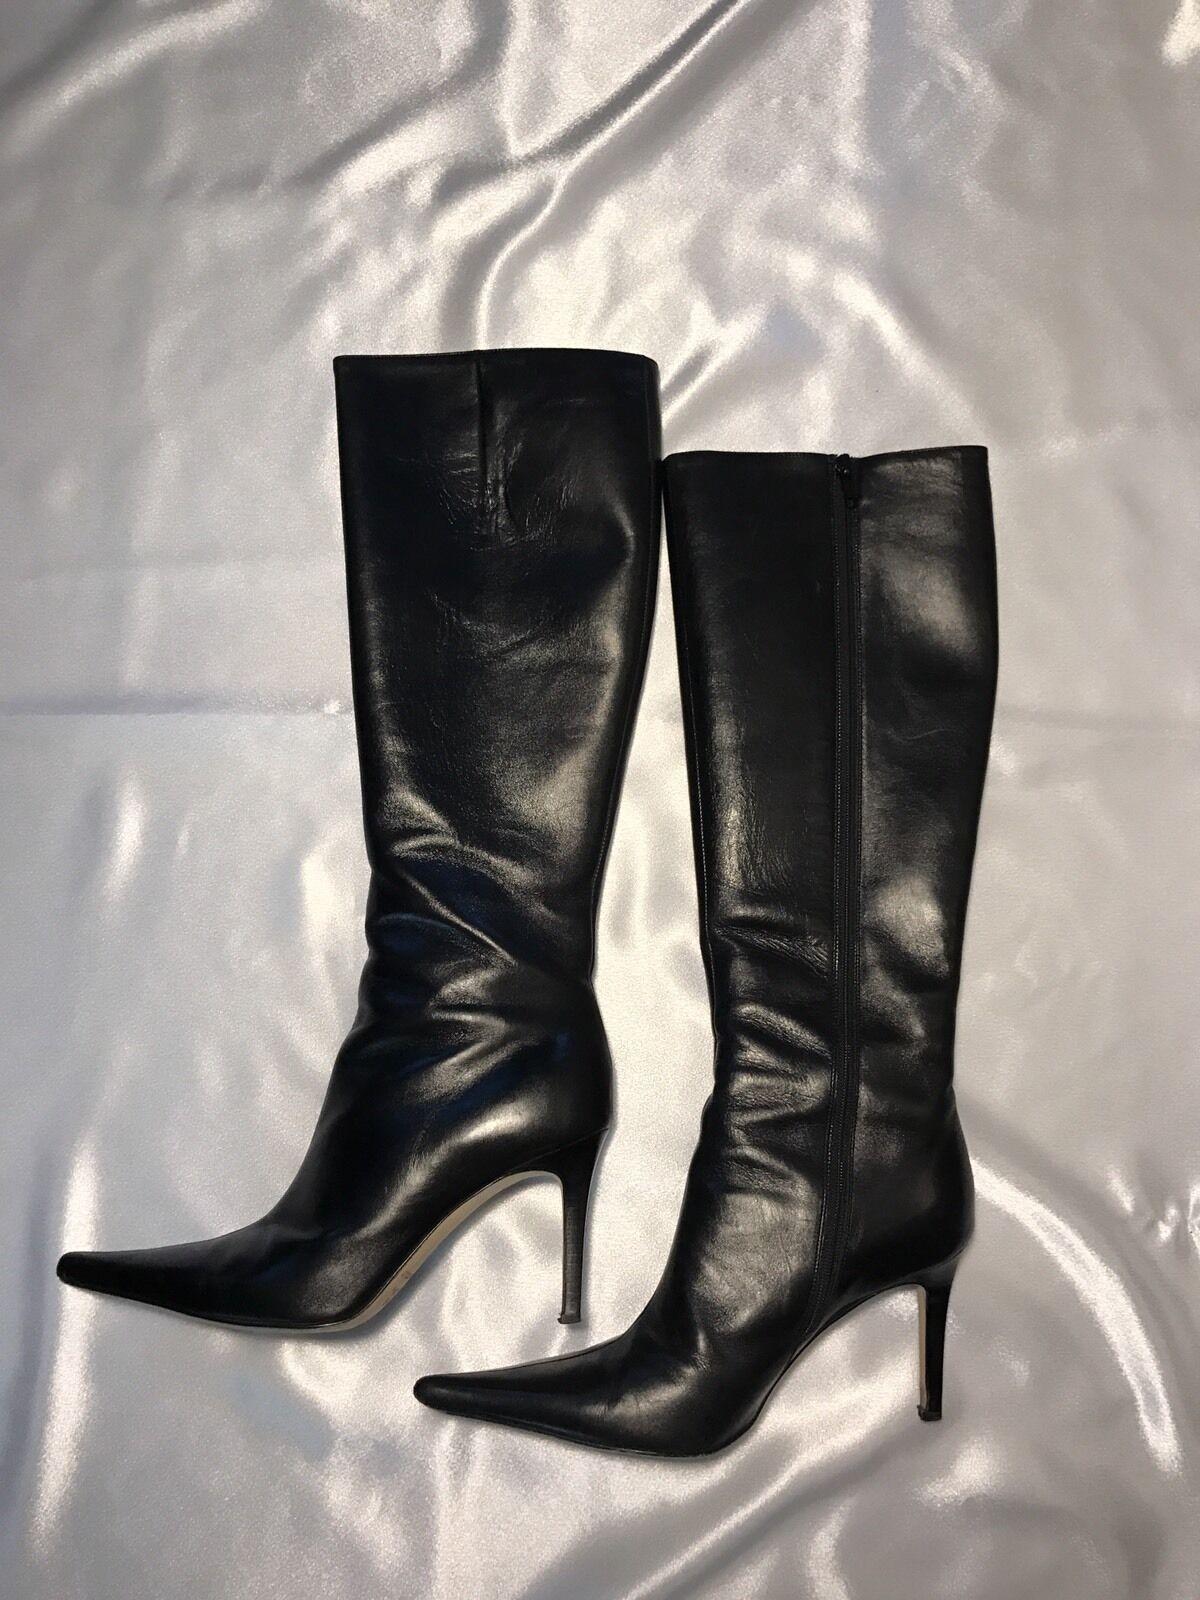 Anne Klein Boots Sz 7 Chicboot Slim Calf Winter Women Black 398 VGUC Made Italy